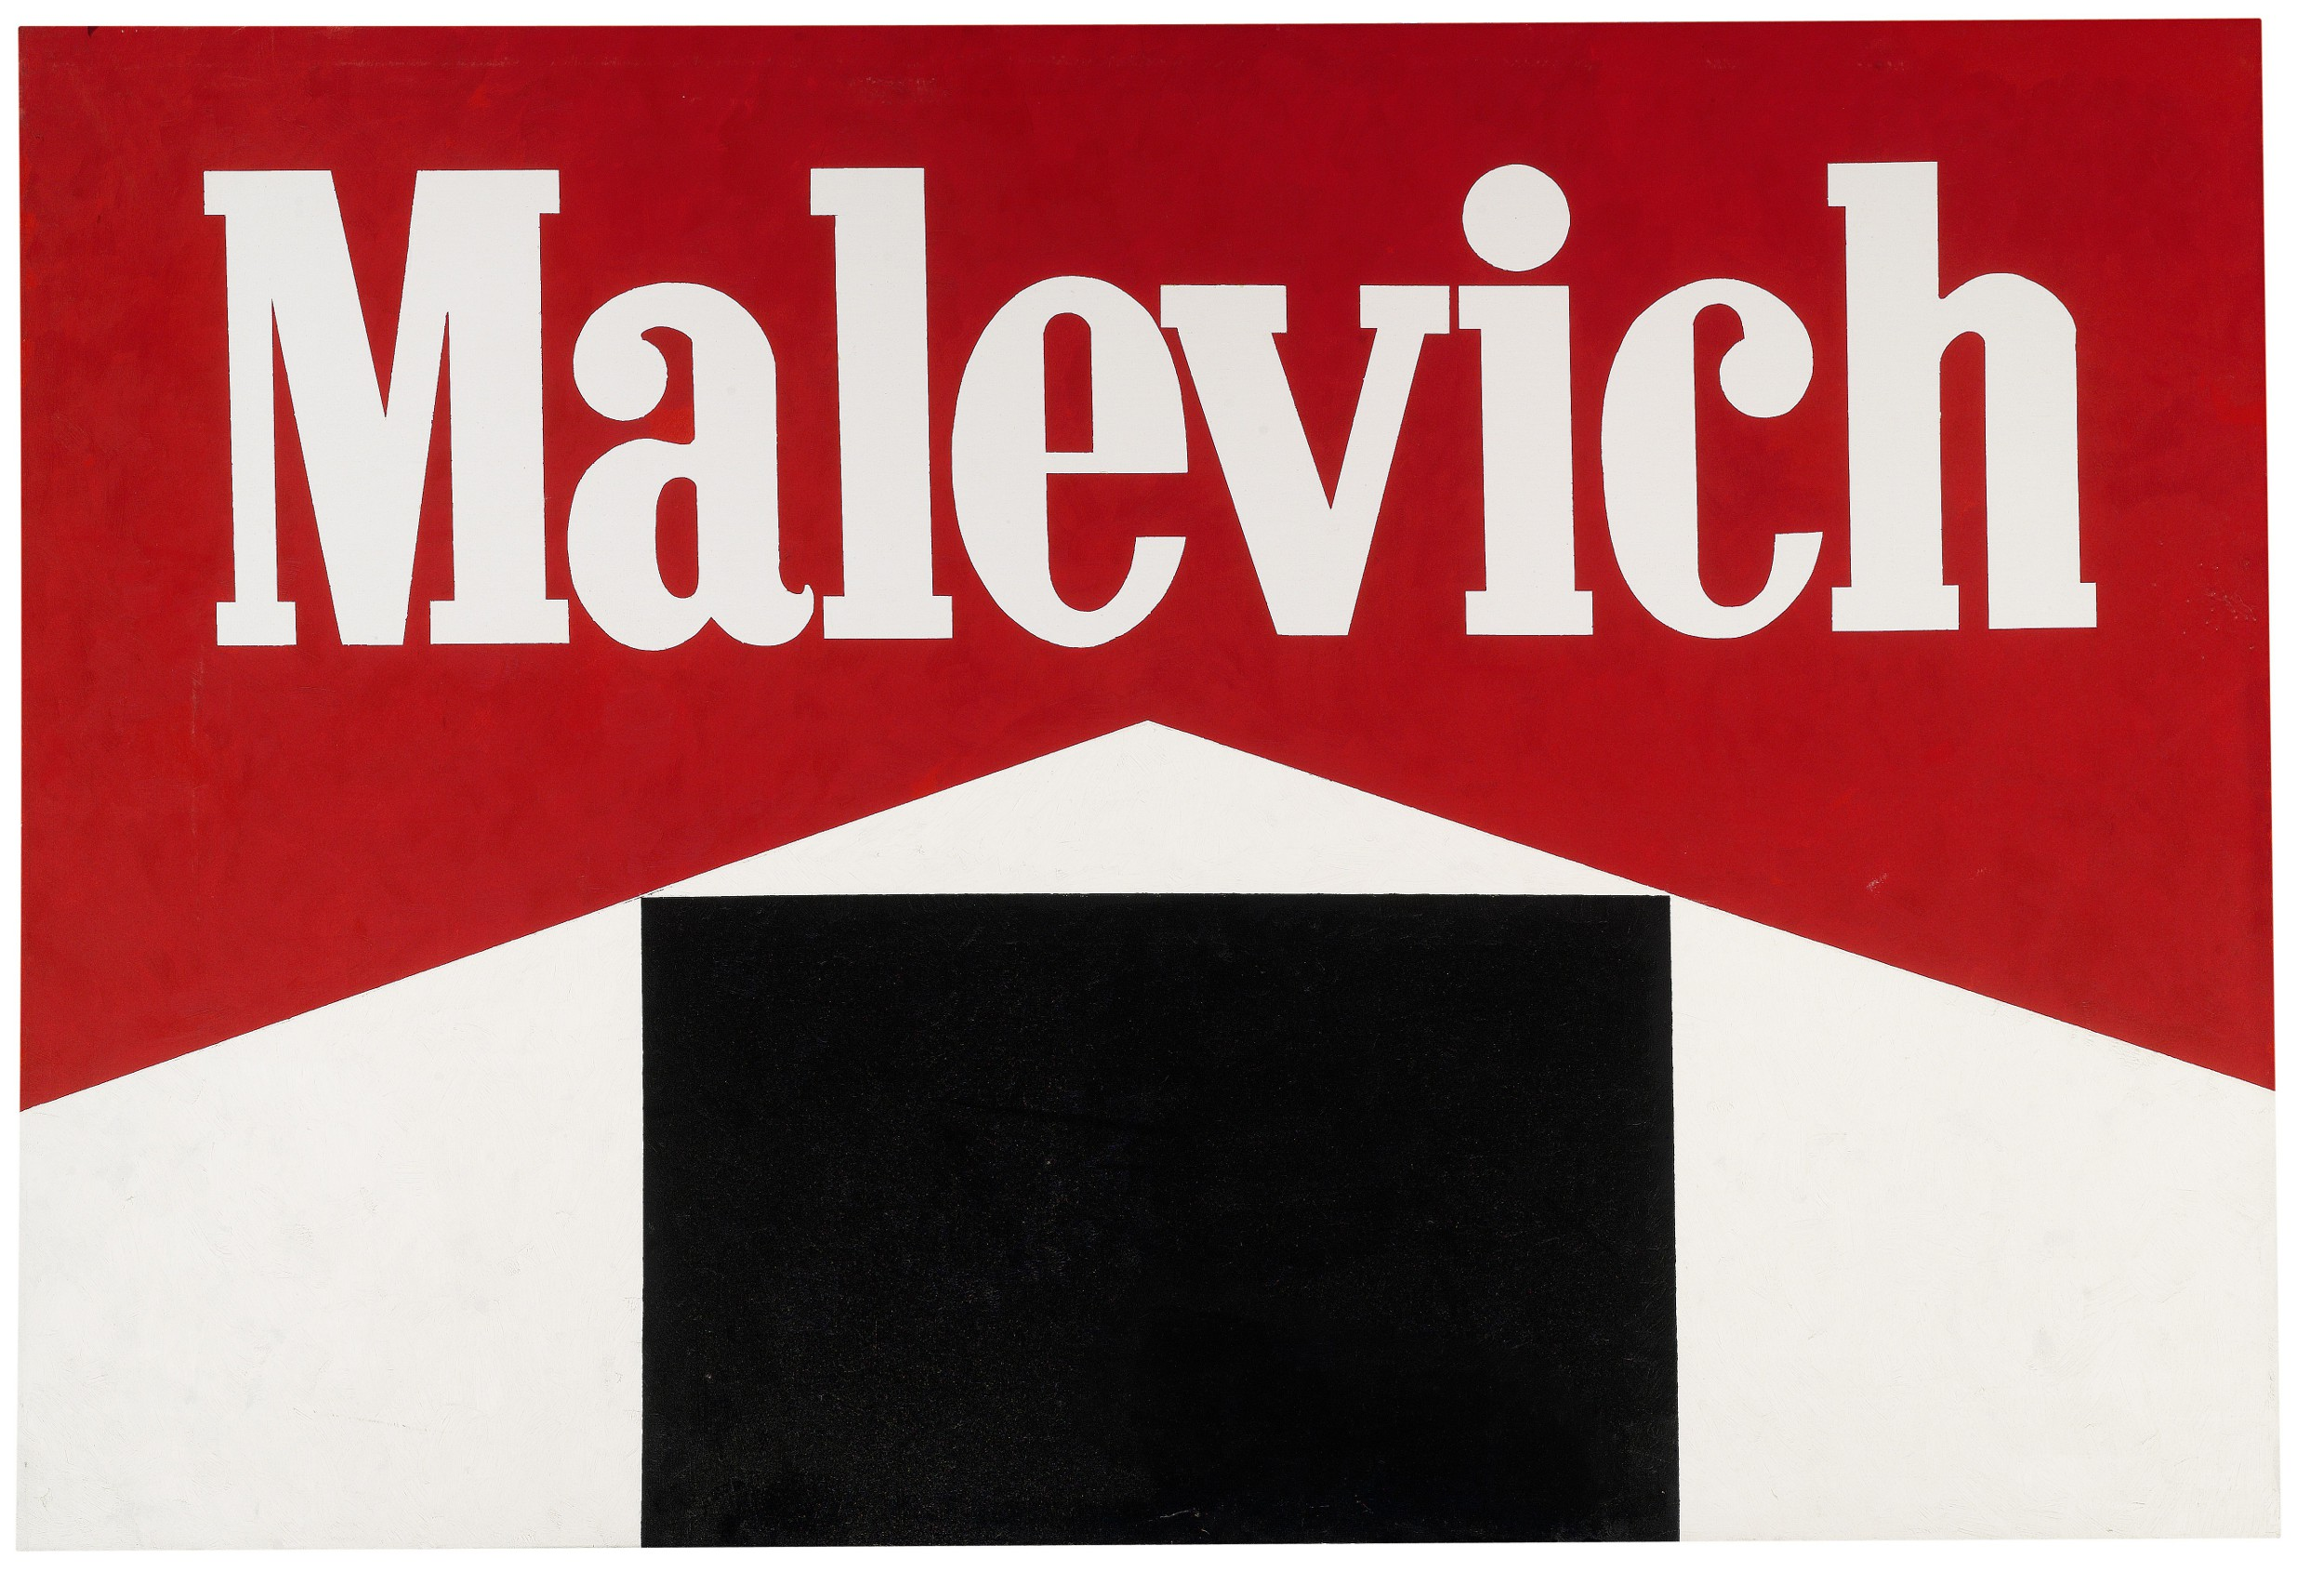 ALEXANDER KOSOLAPOV Malevich - Black Square 1987 Oil on canvas 119.5 x 173 cm Courtesy of The Tsukanov Family Foundation, London